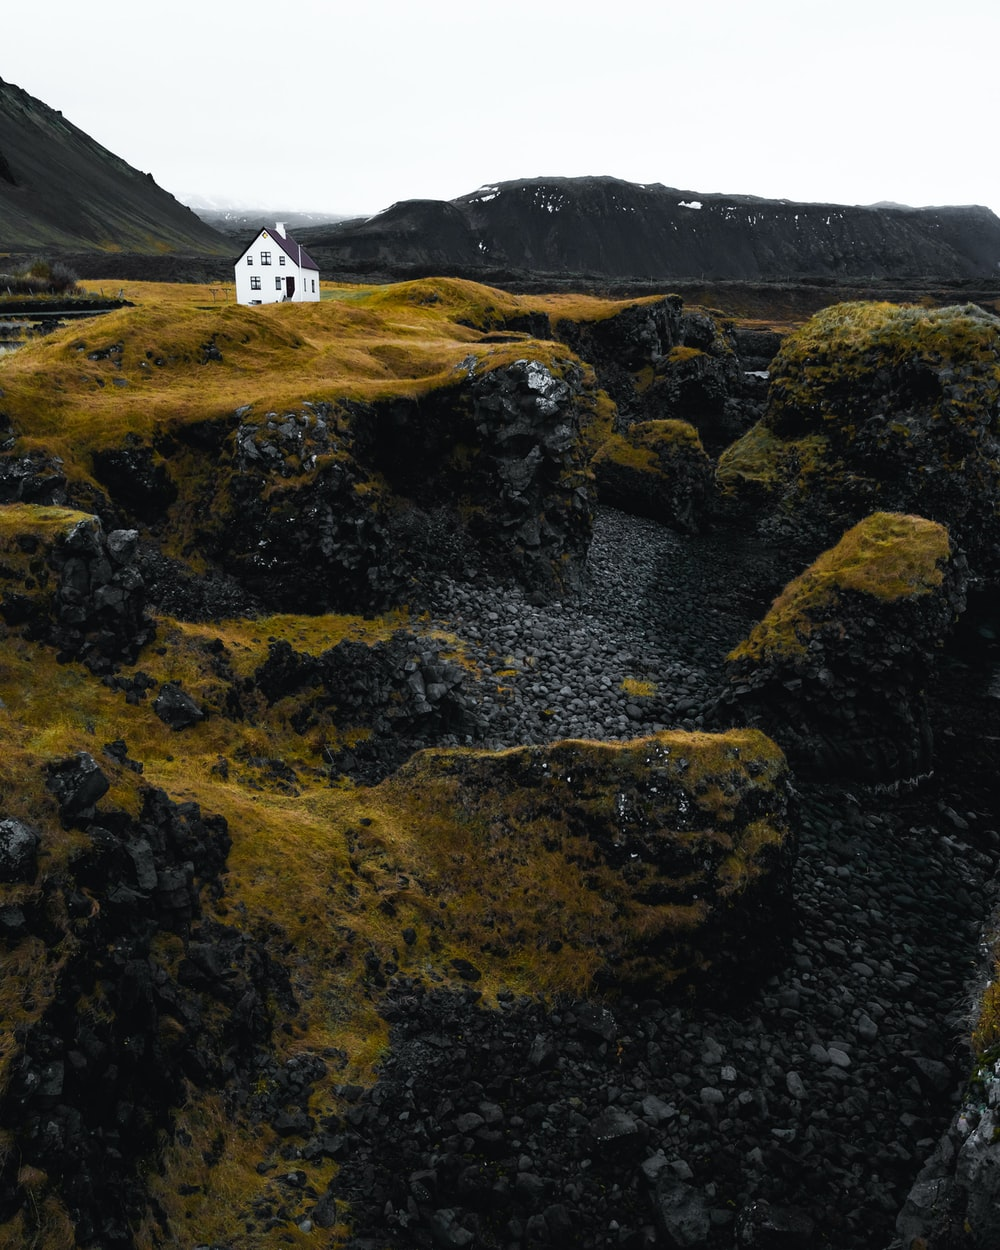 white house on cliff